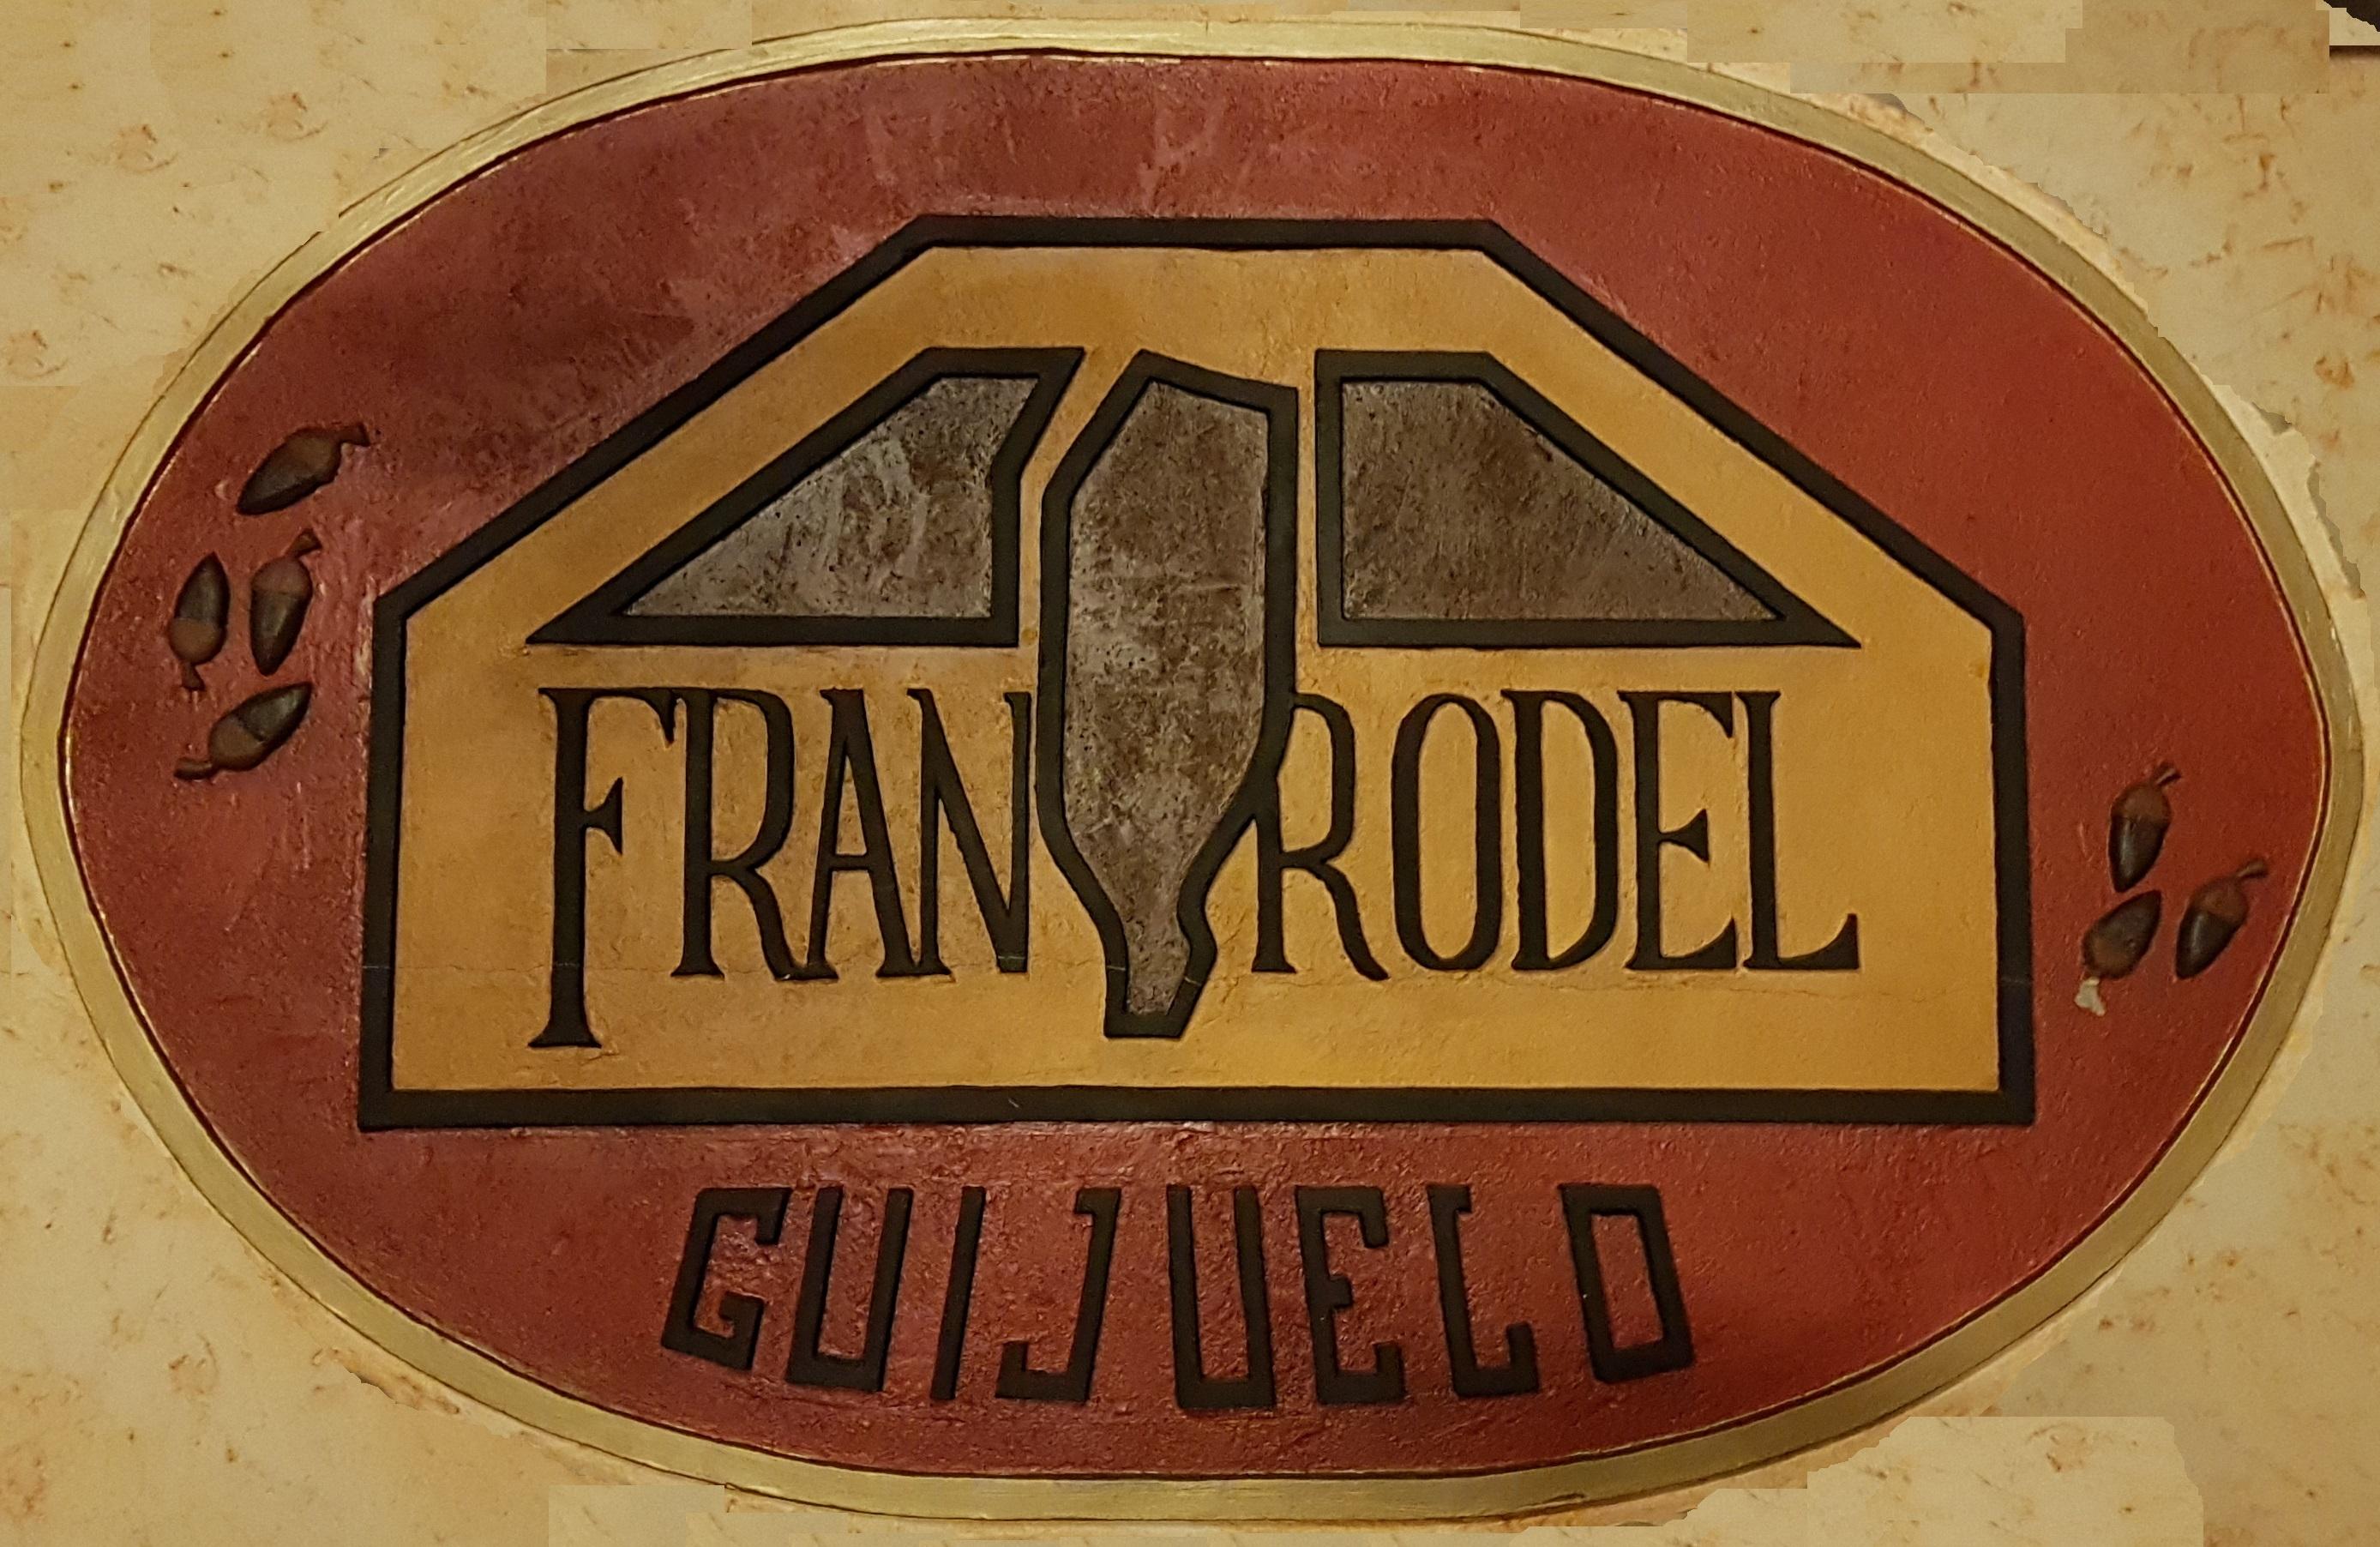 FRANRODEL